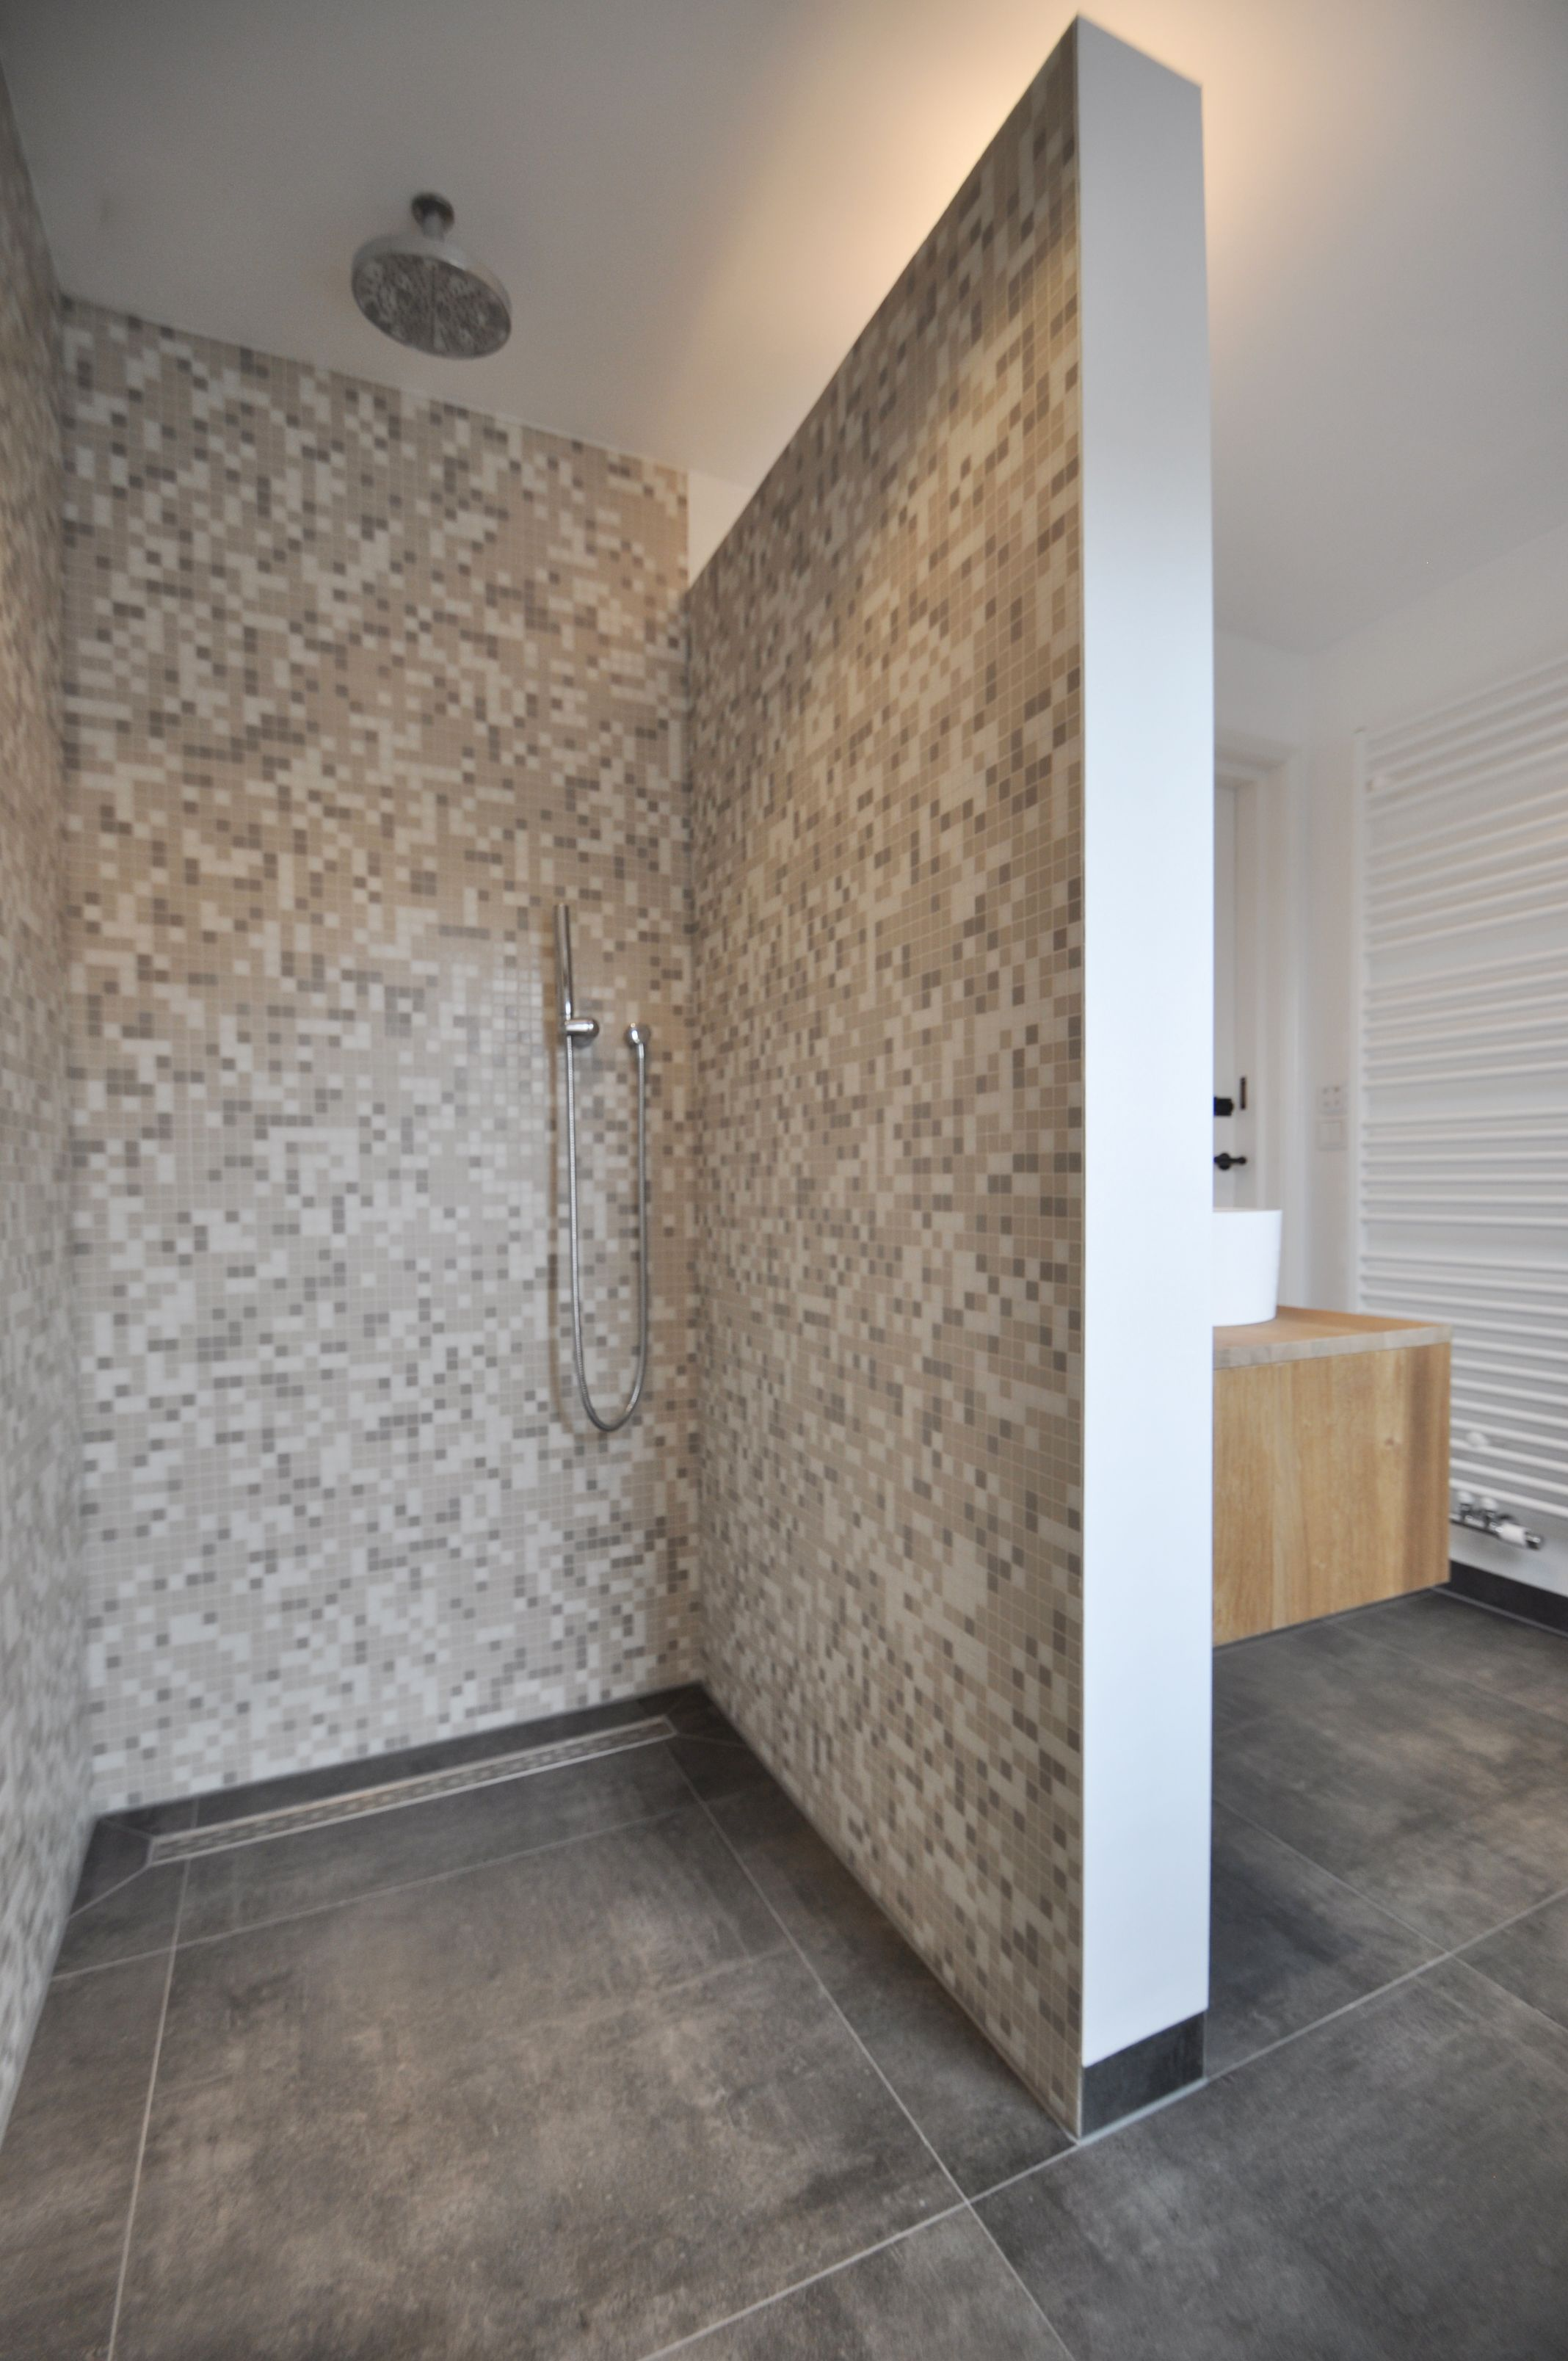 www.herijgers.nl Sfeervolle badkamer met beton-look tegels, mozaiek ...